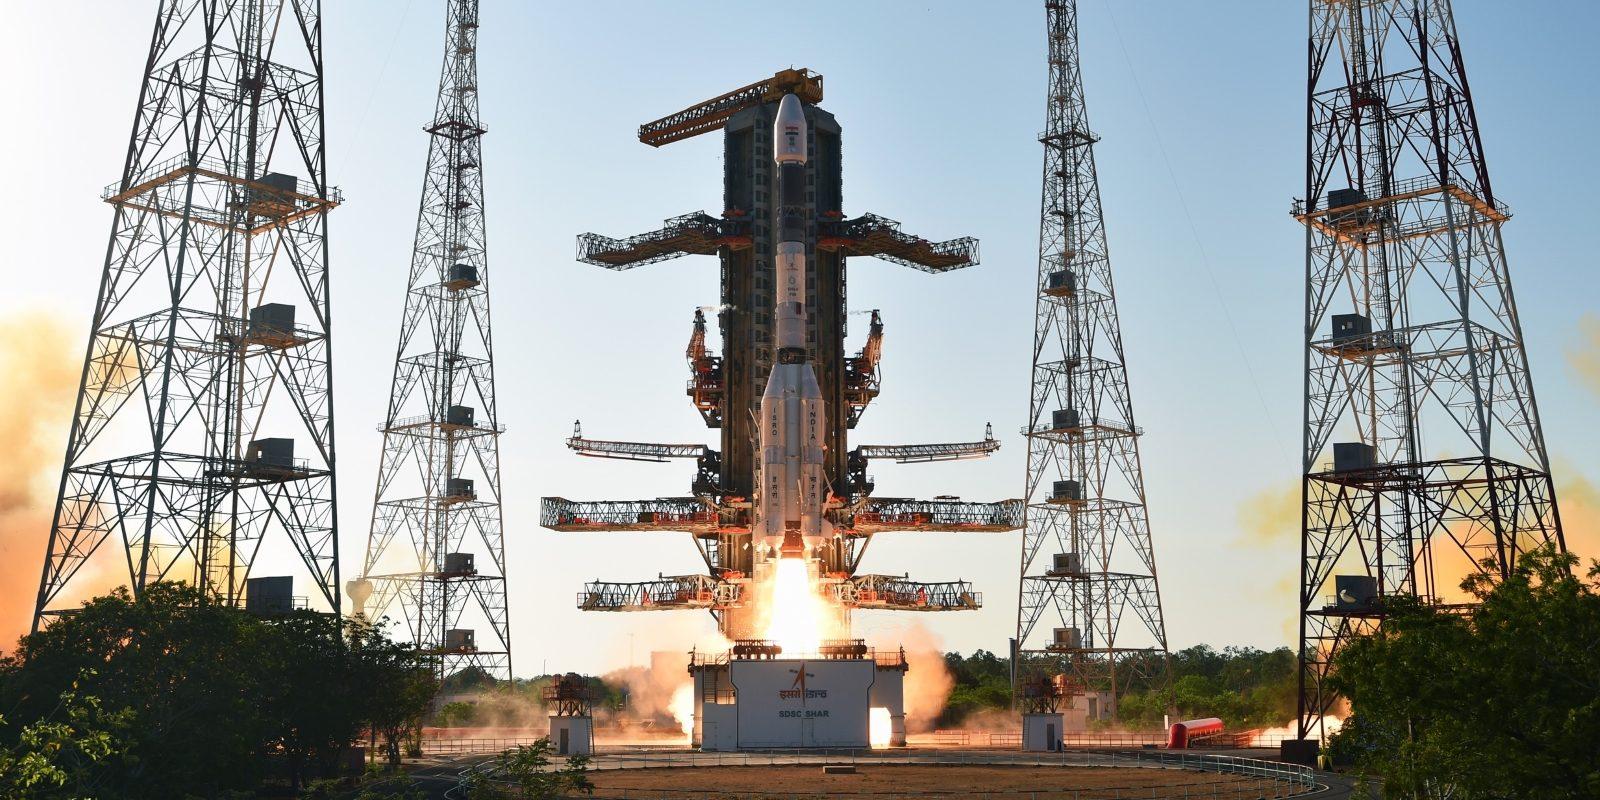 GSLV-F09 / GSAT-9 launch